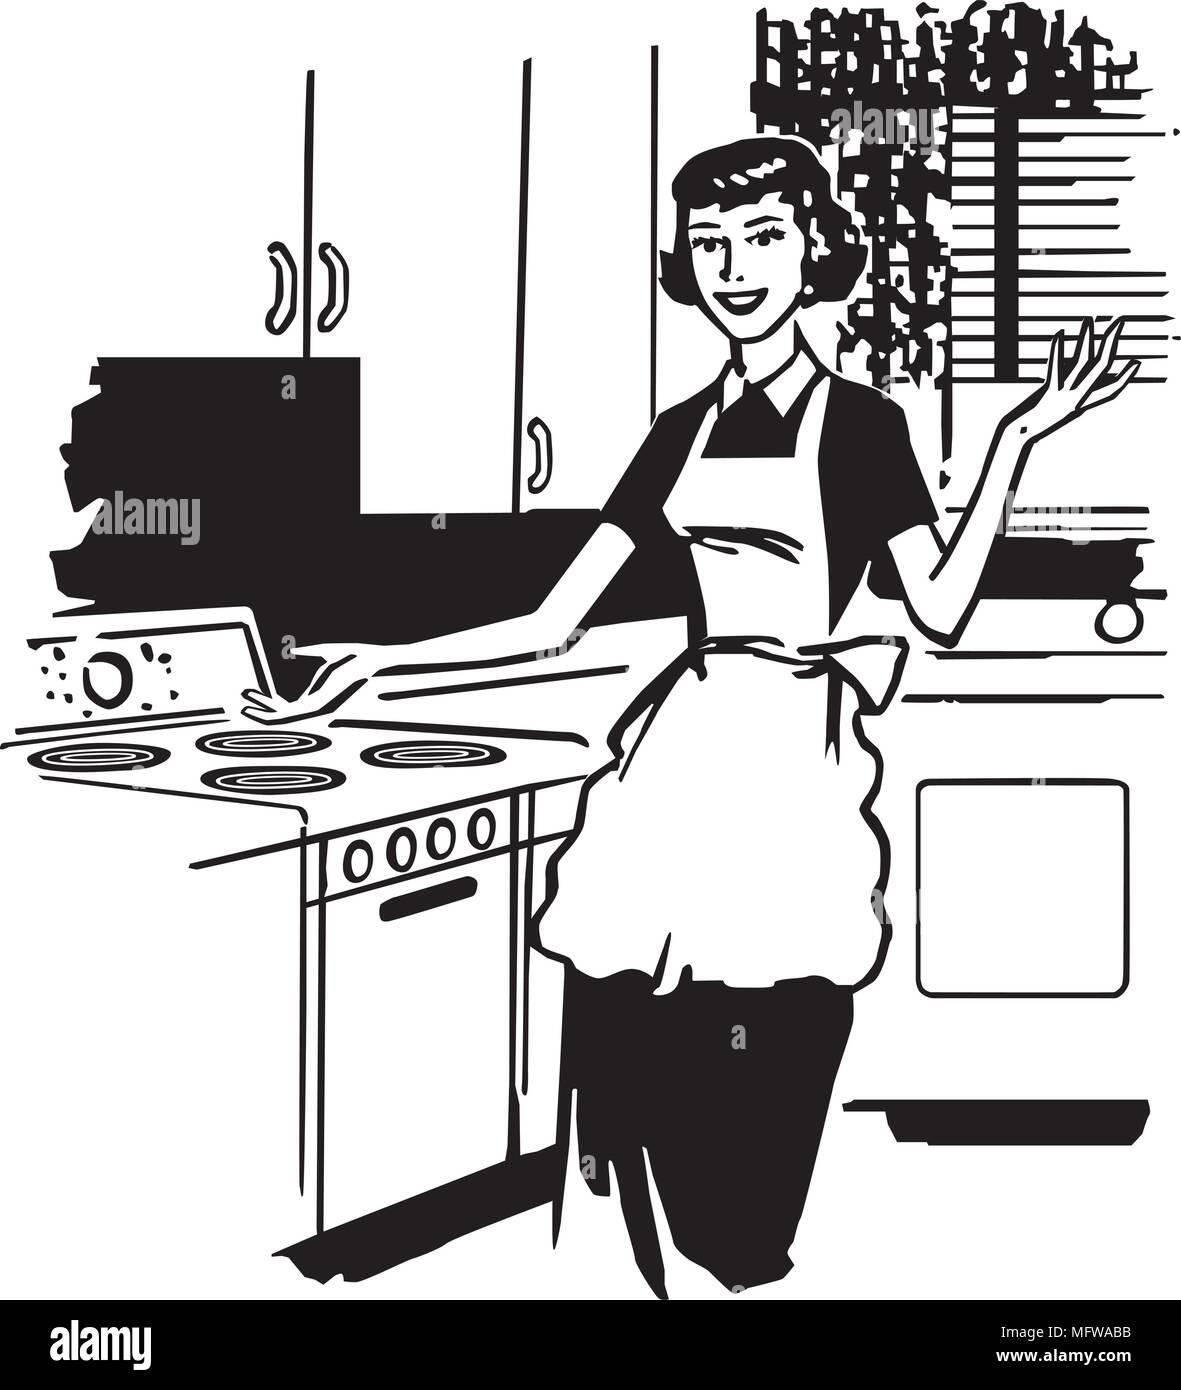 Modern Housewife Retro Clipart Illustration Stock Vector Image Art Alamy